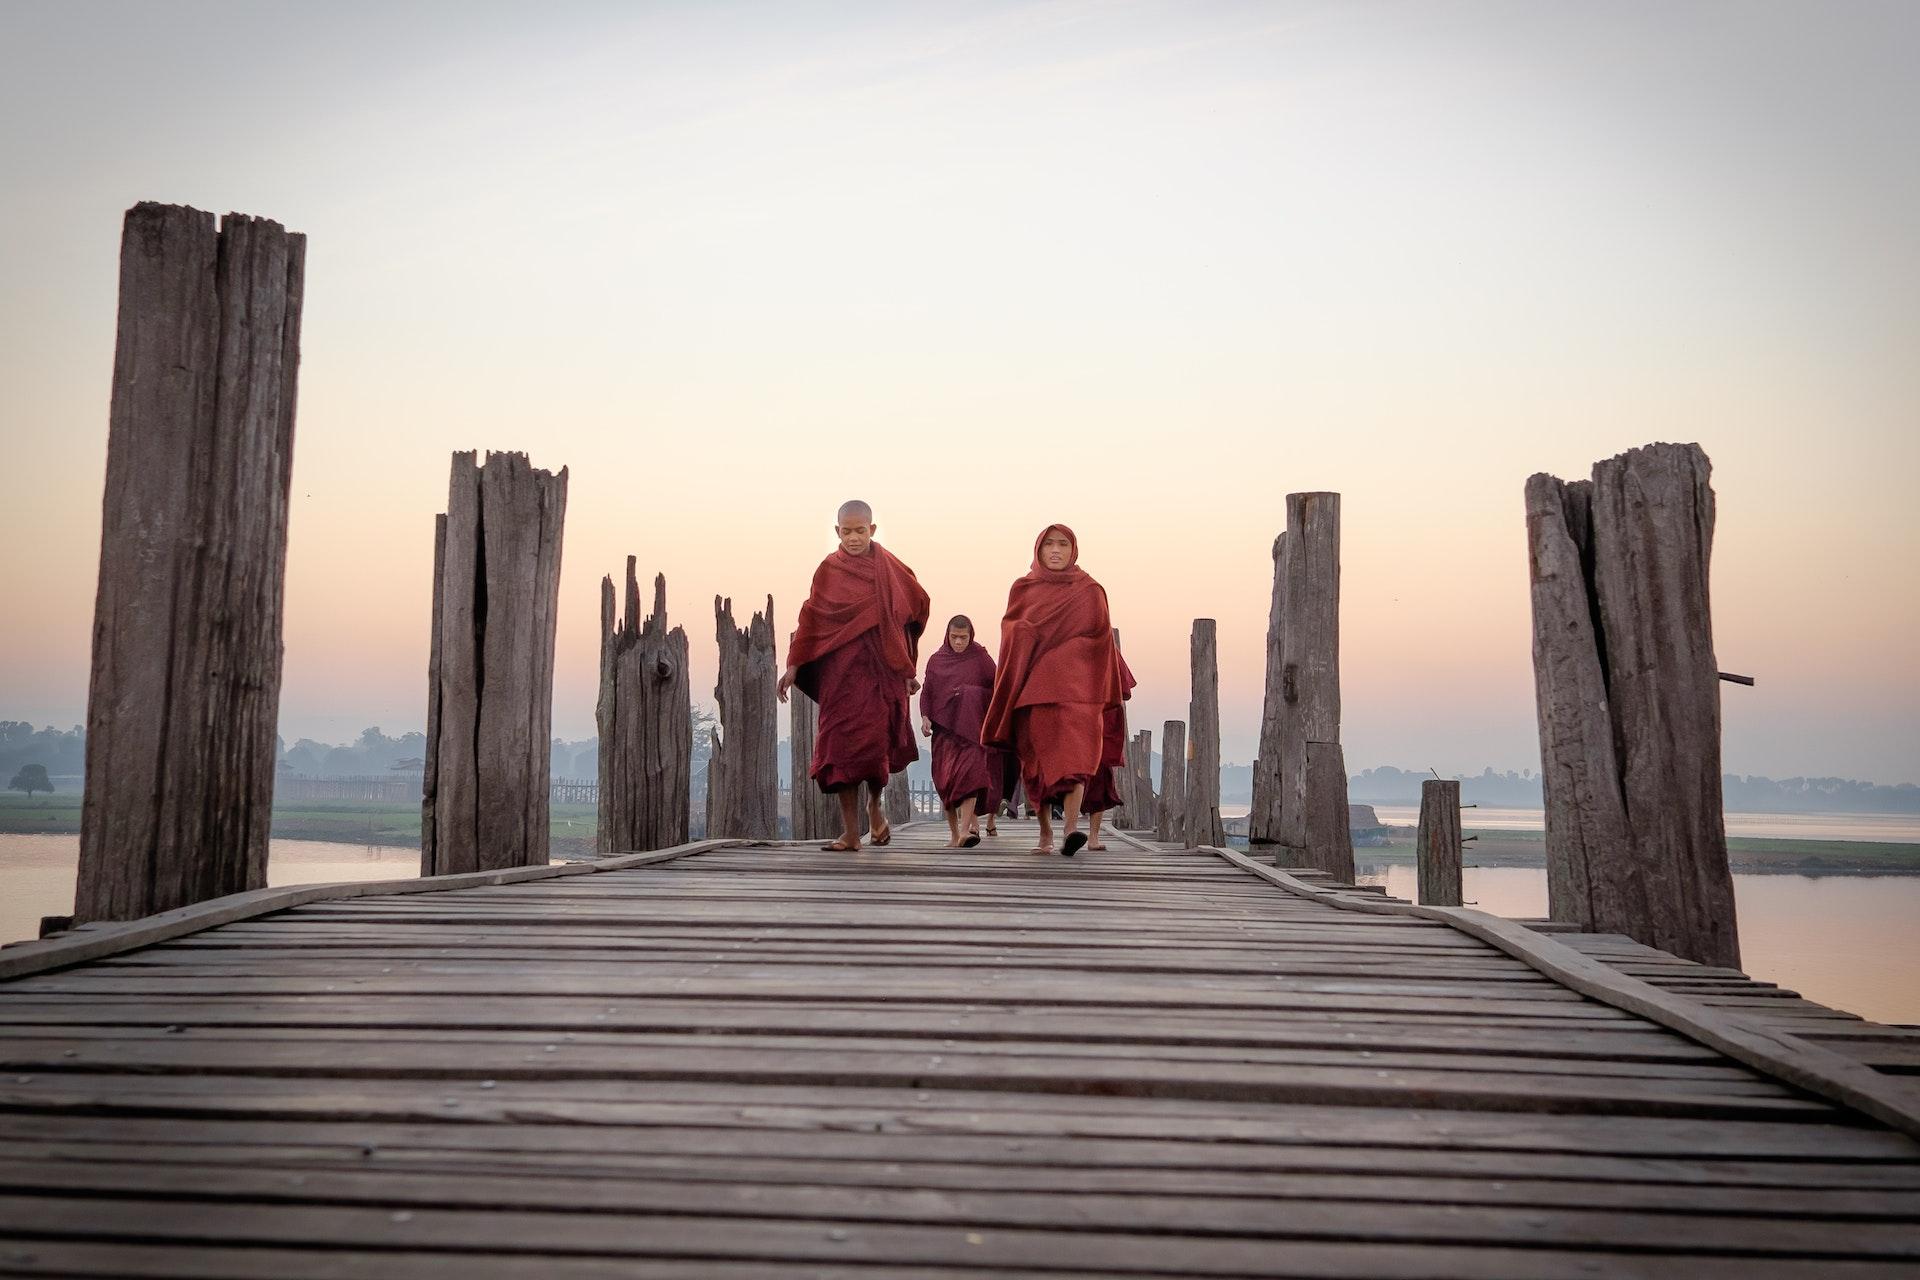 Monks commuting on U Bein Bridge, Myanmar